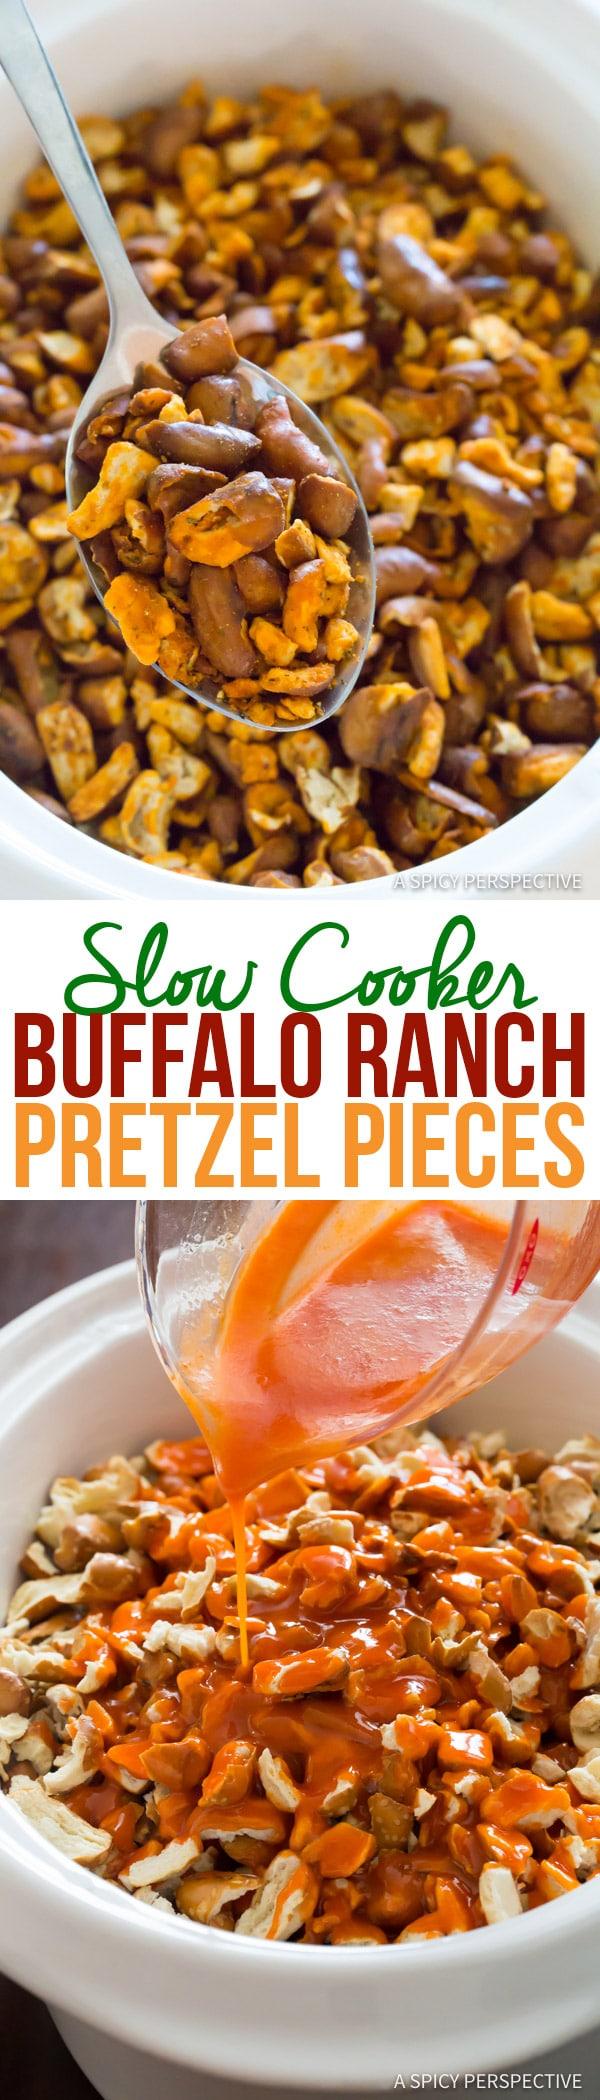 4-Ingredient Slow Cooker Buffalo Ranch Pretzel Pieces (+Oven Instructions)   ASpicyPerspective.com